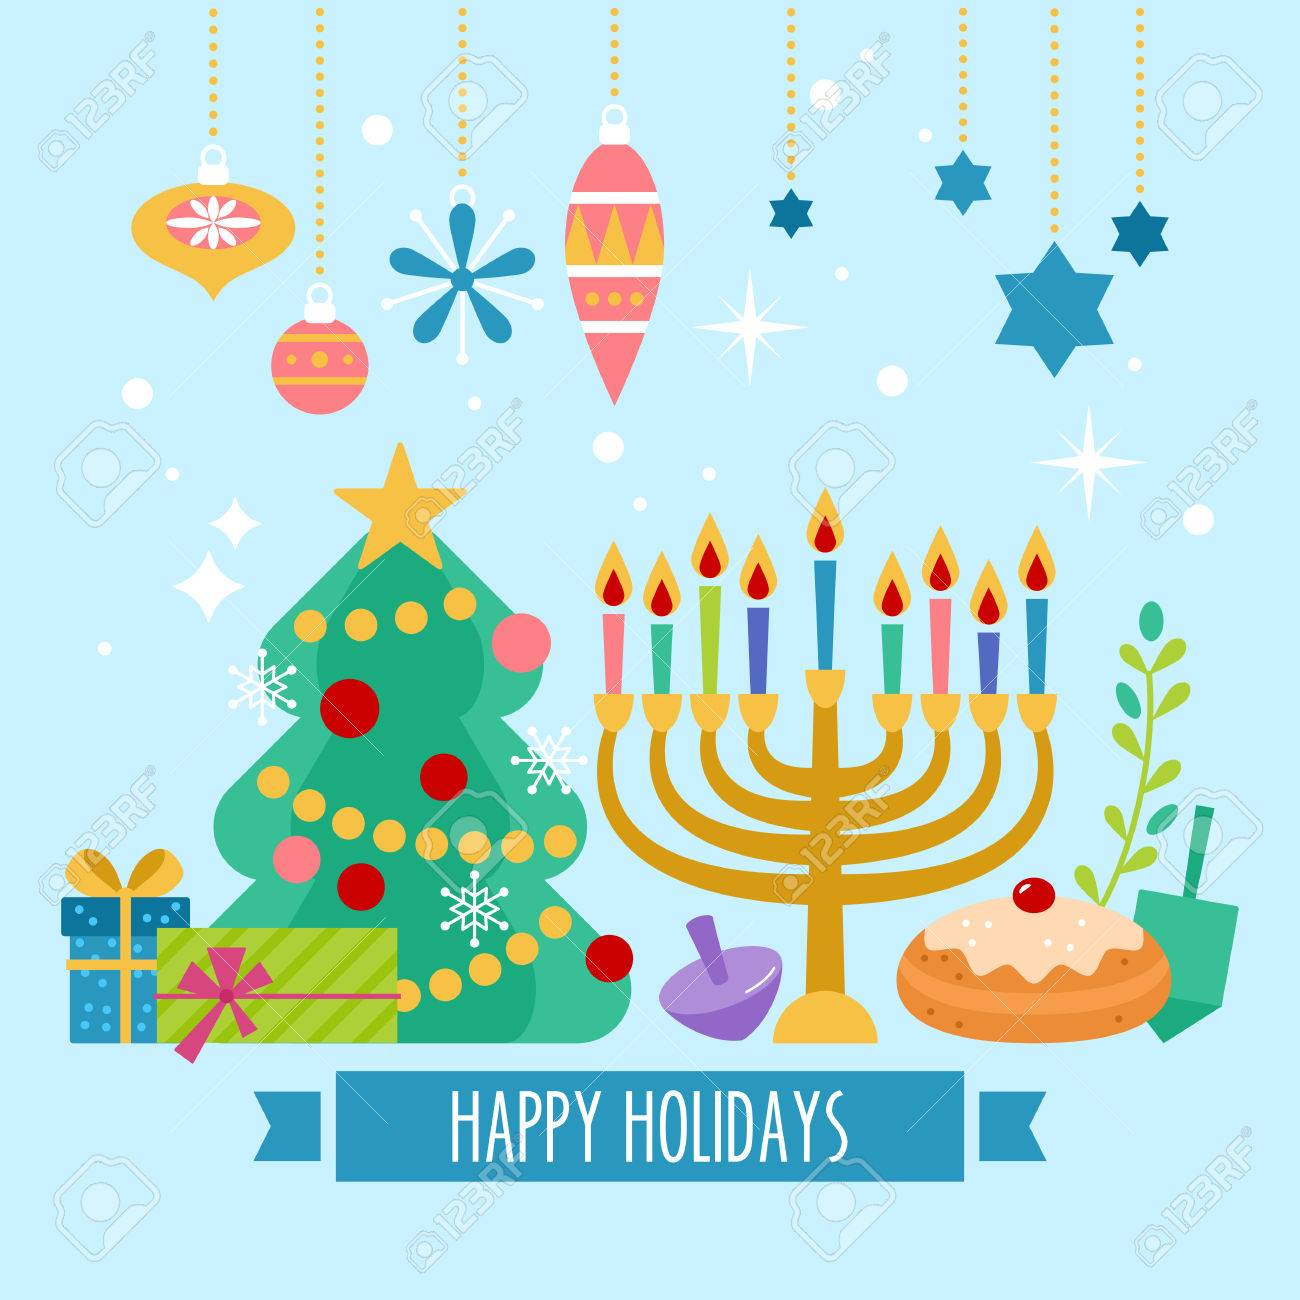 Christmas and Hanukkah holiday banner design.